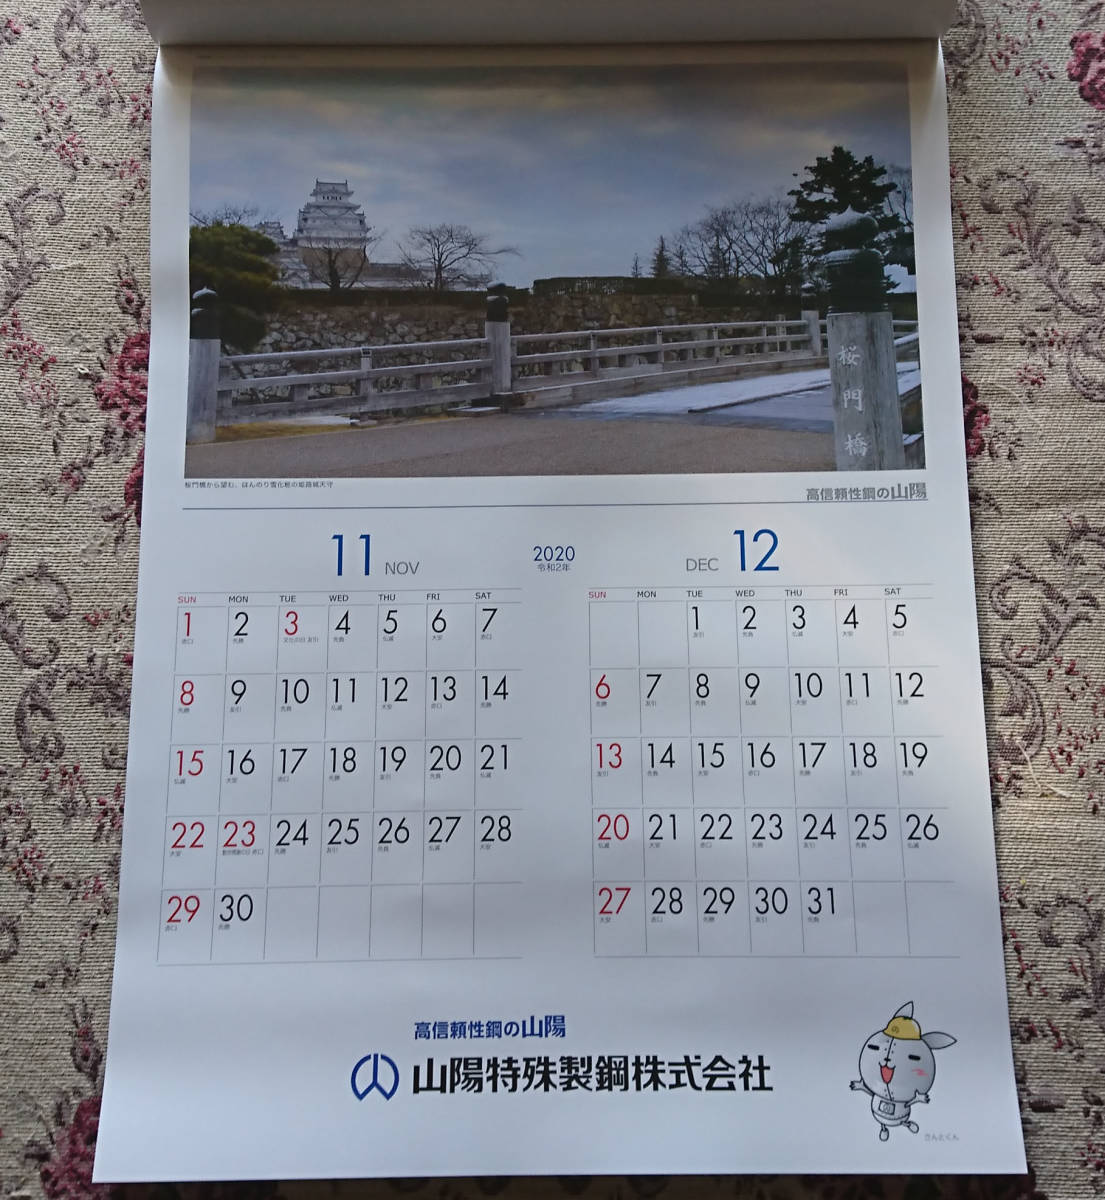 【新品・送料無料】山陽特殊製鋼 株主優待 2020年カレンダー 姫路城・円教寺 風景_画像5